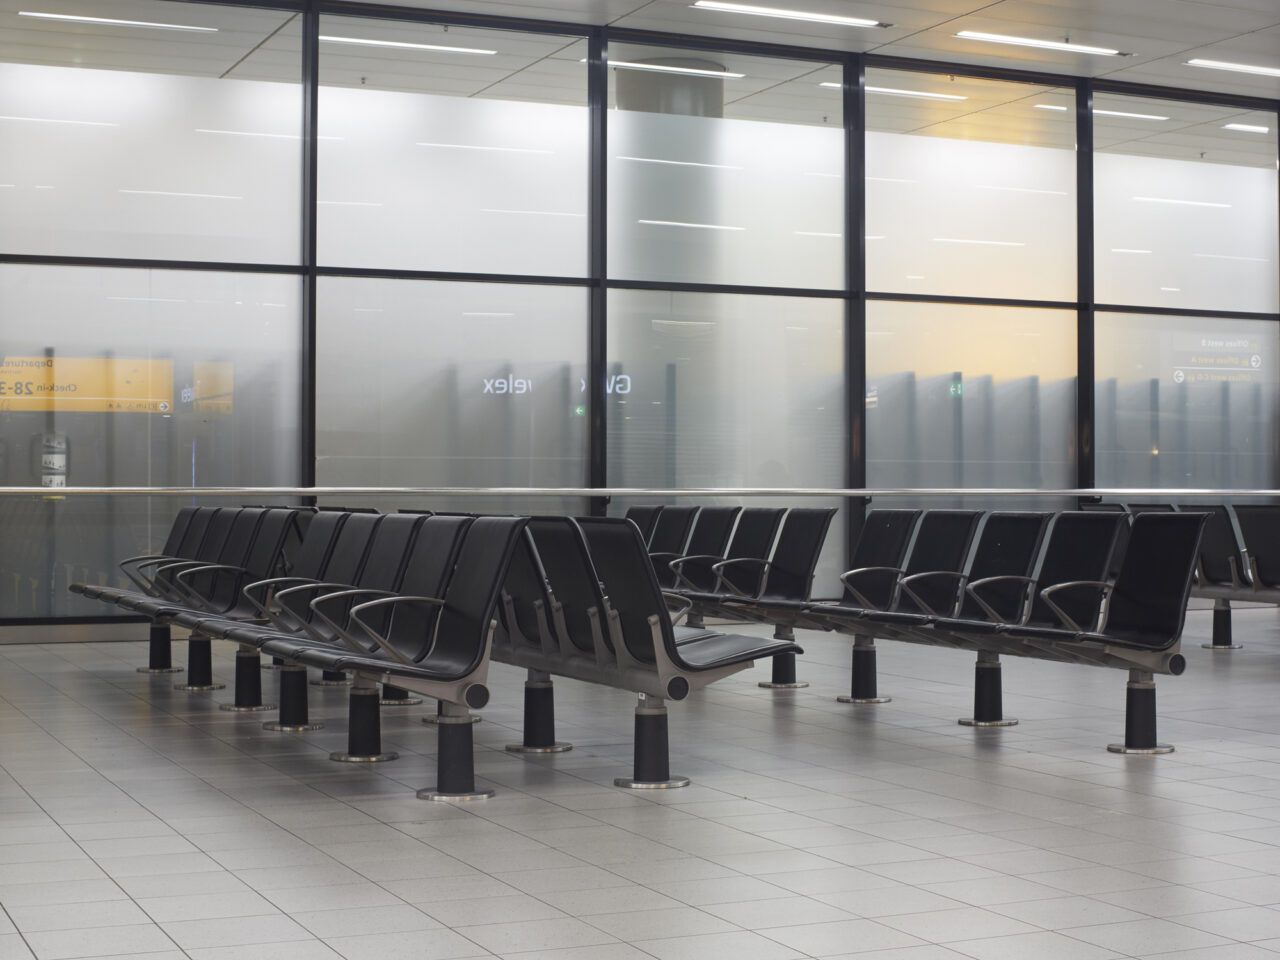 Mohamed's tijdelijke slaapplek, vertrekhal Schiphol